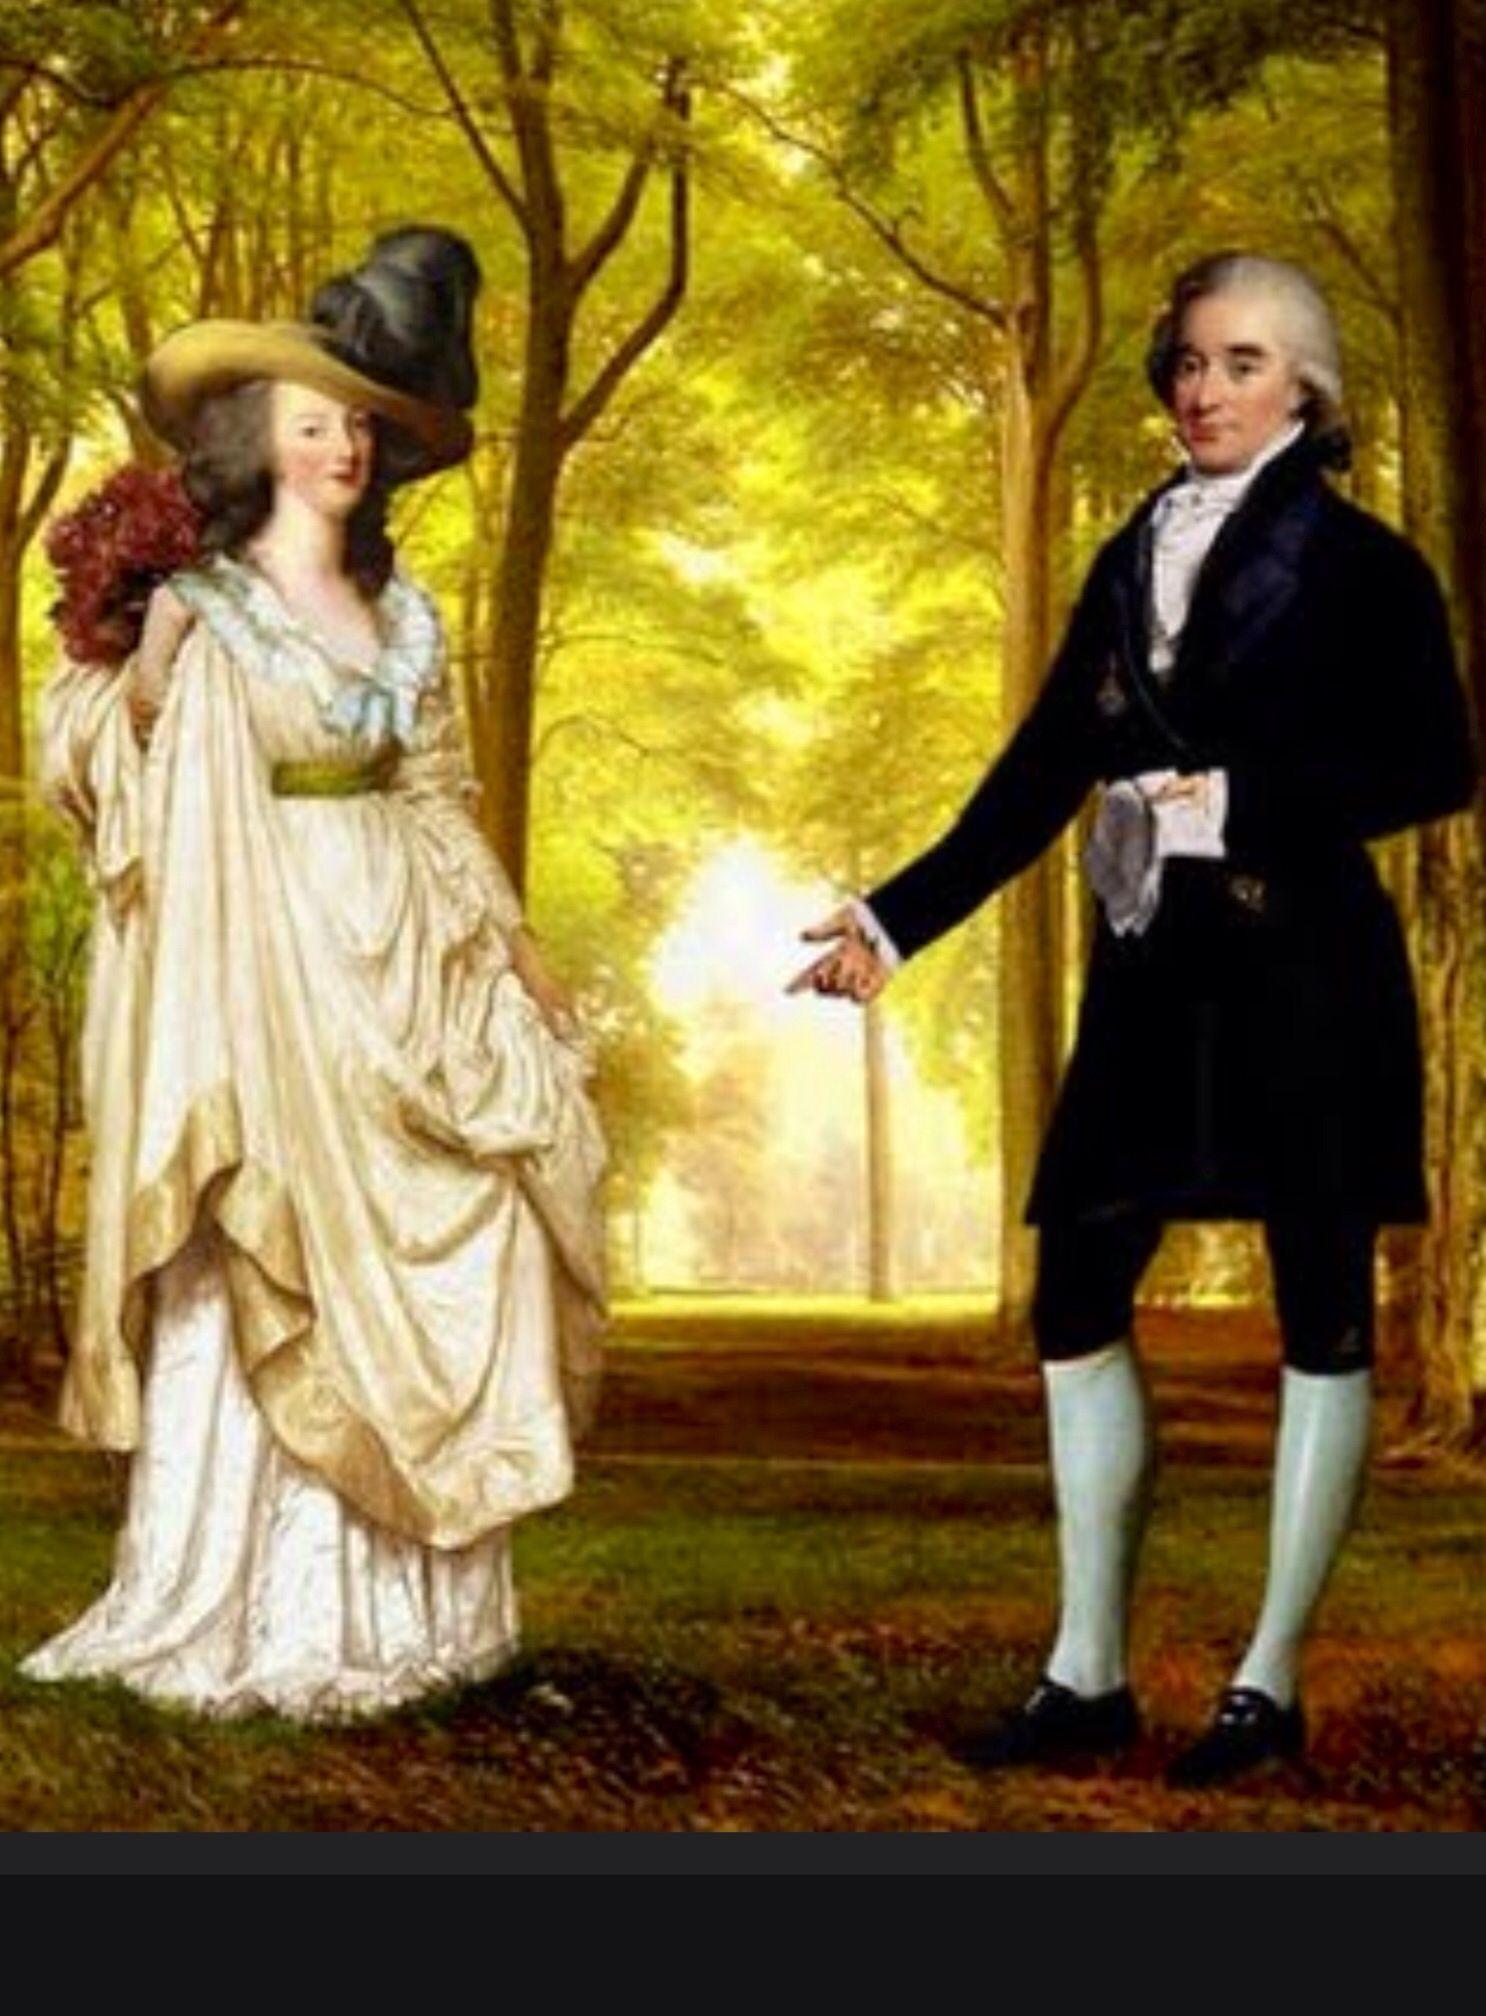 Maria Antonieta Y Axel De Fersen 18th Century Clothing Century Clothing Marie Antionette